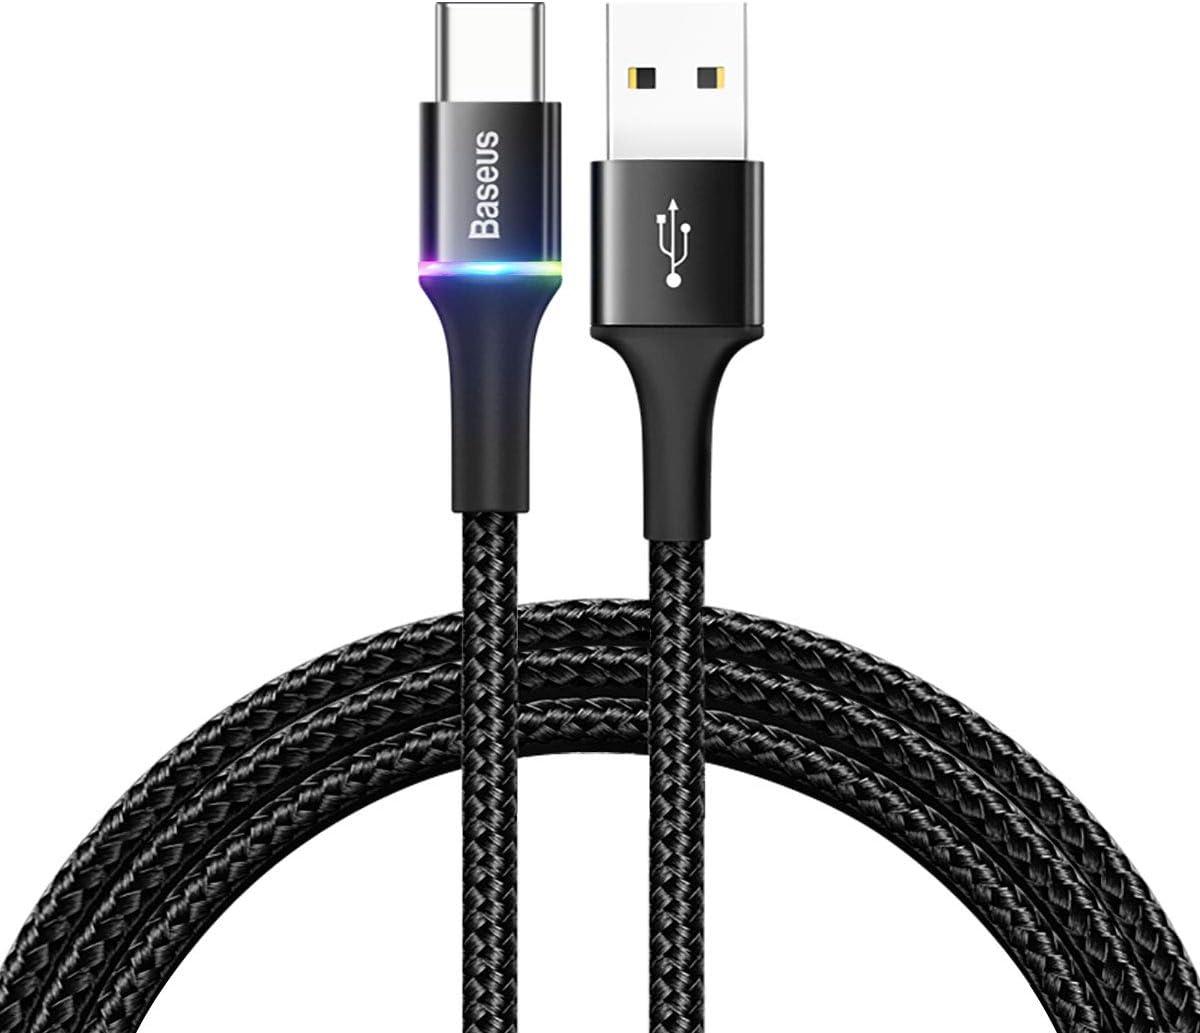 Baseus USB C Kabel, USB C Ladekabel, 2M